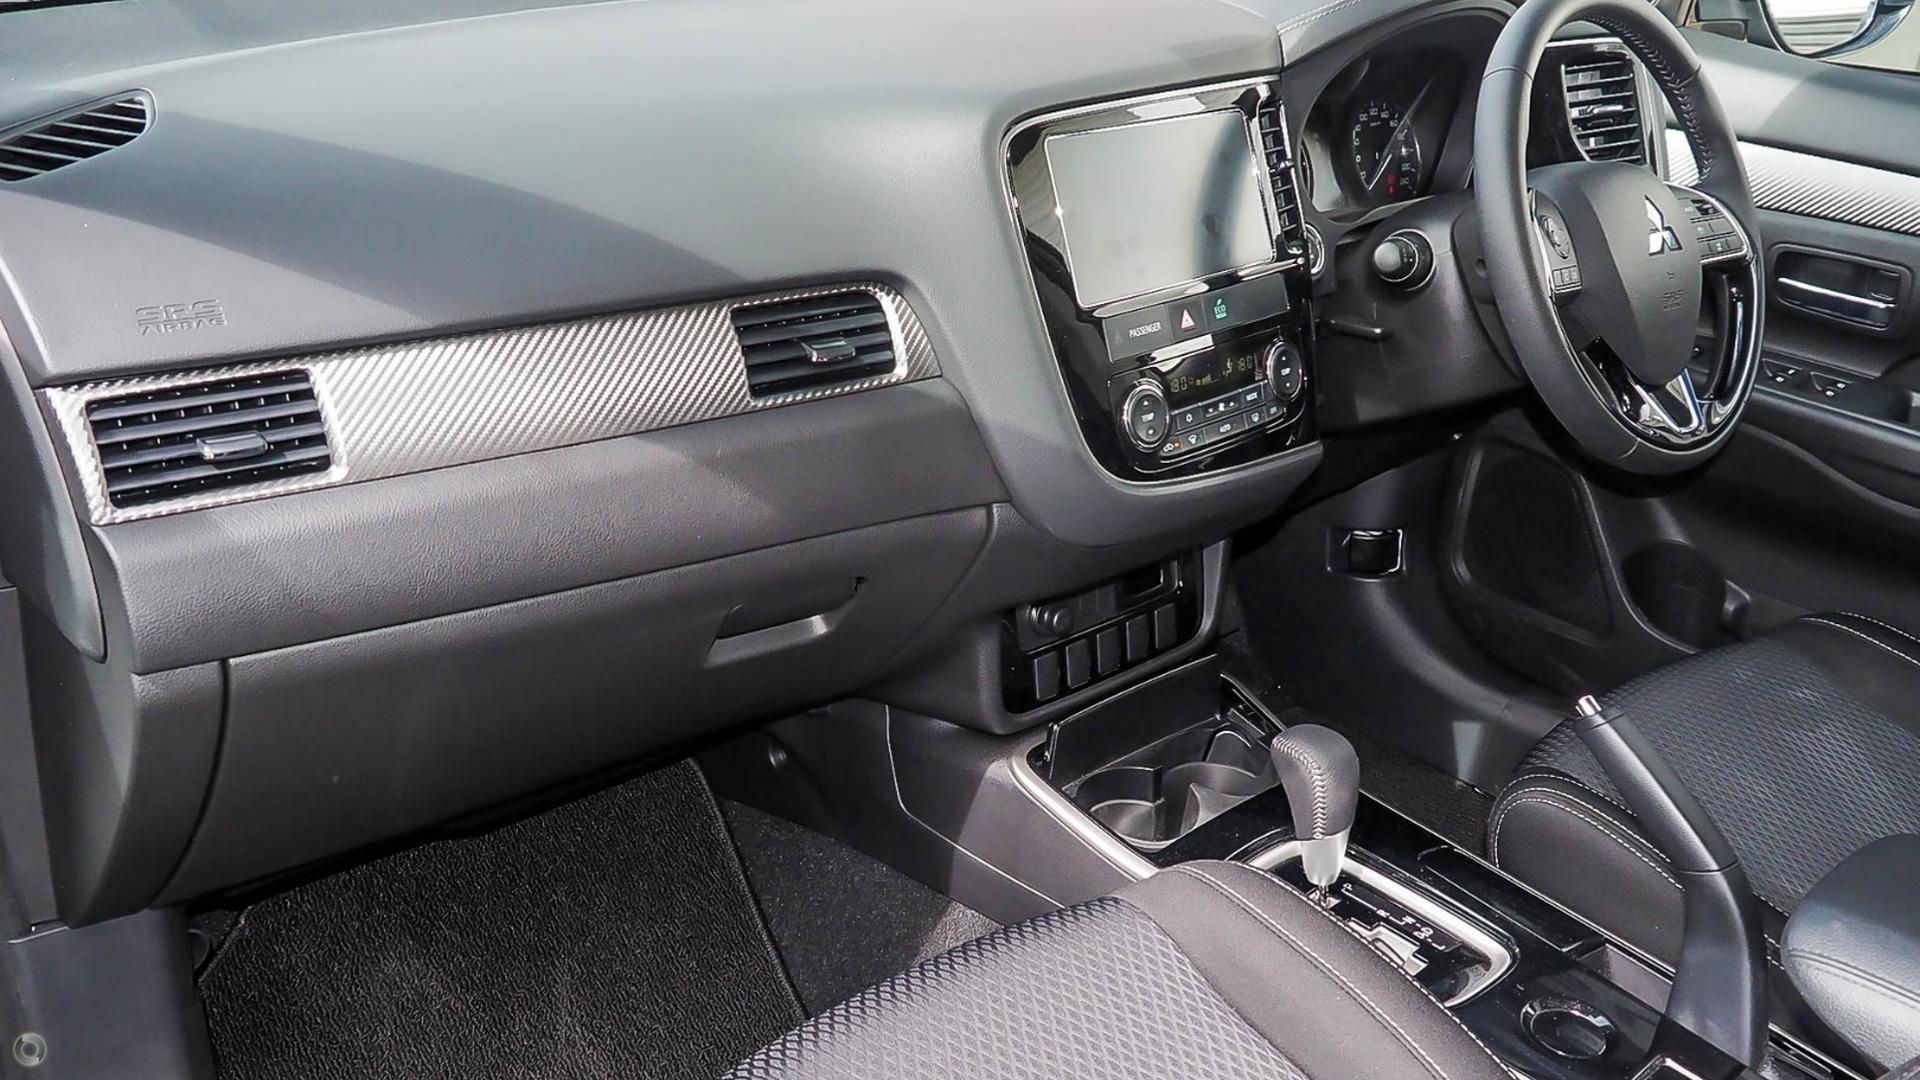 2018 Mitsubishi Outlander Ls